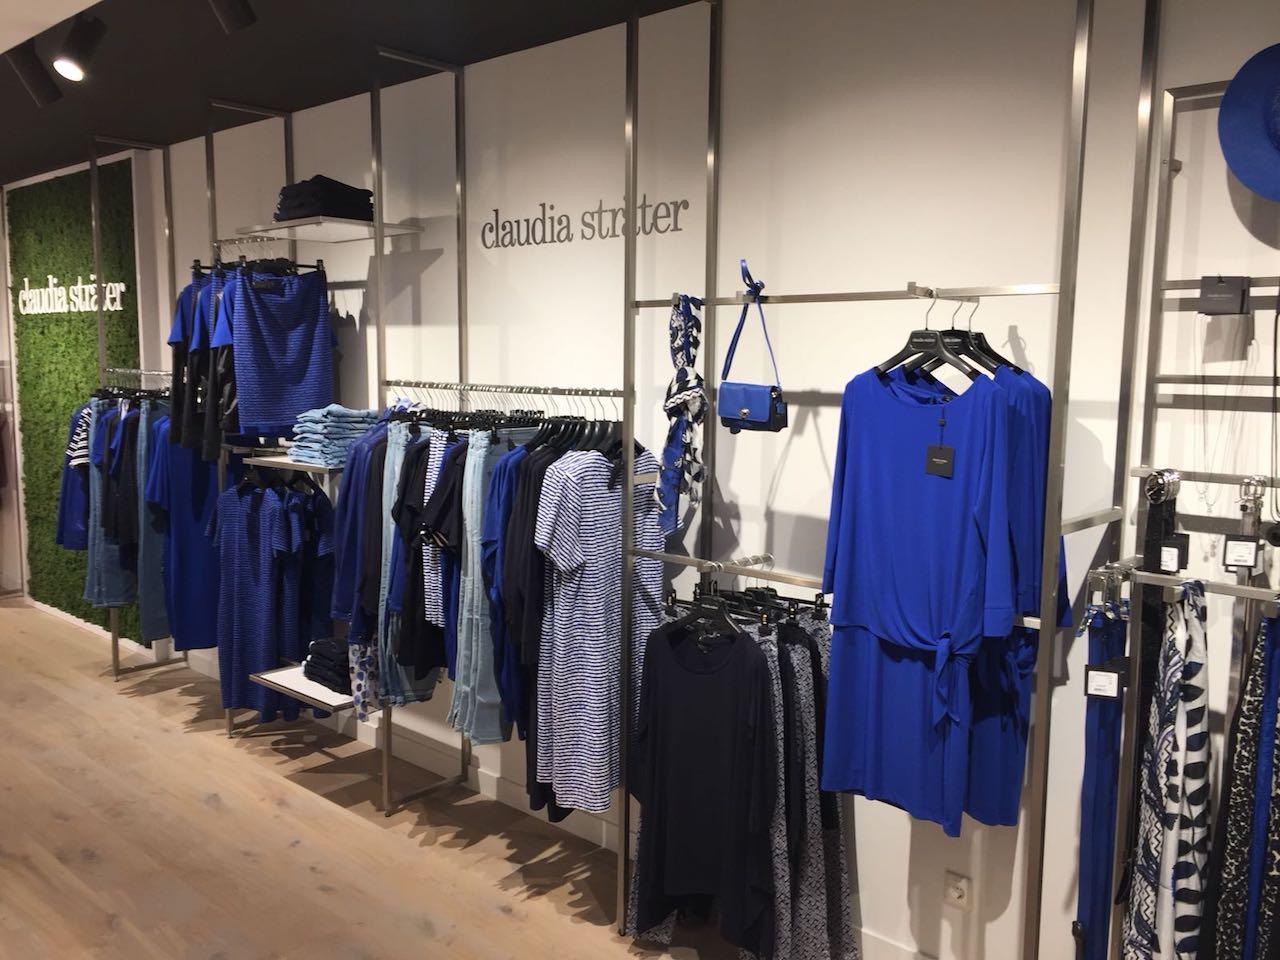 Rvs kledingschap op maat gemaakt in kledingzaak